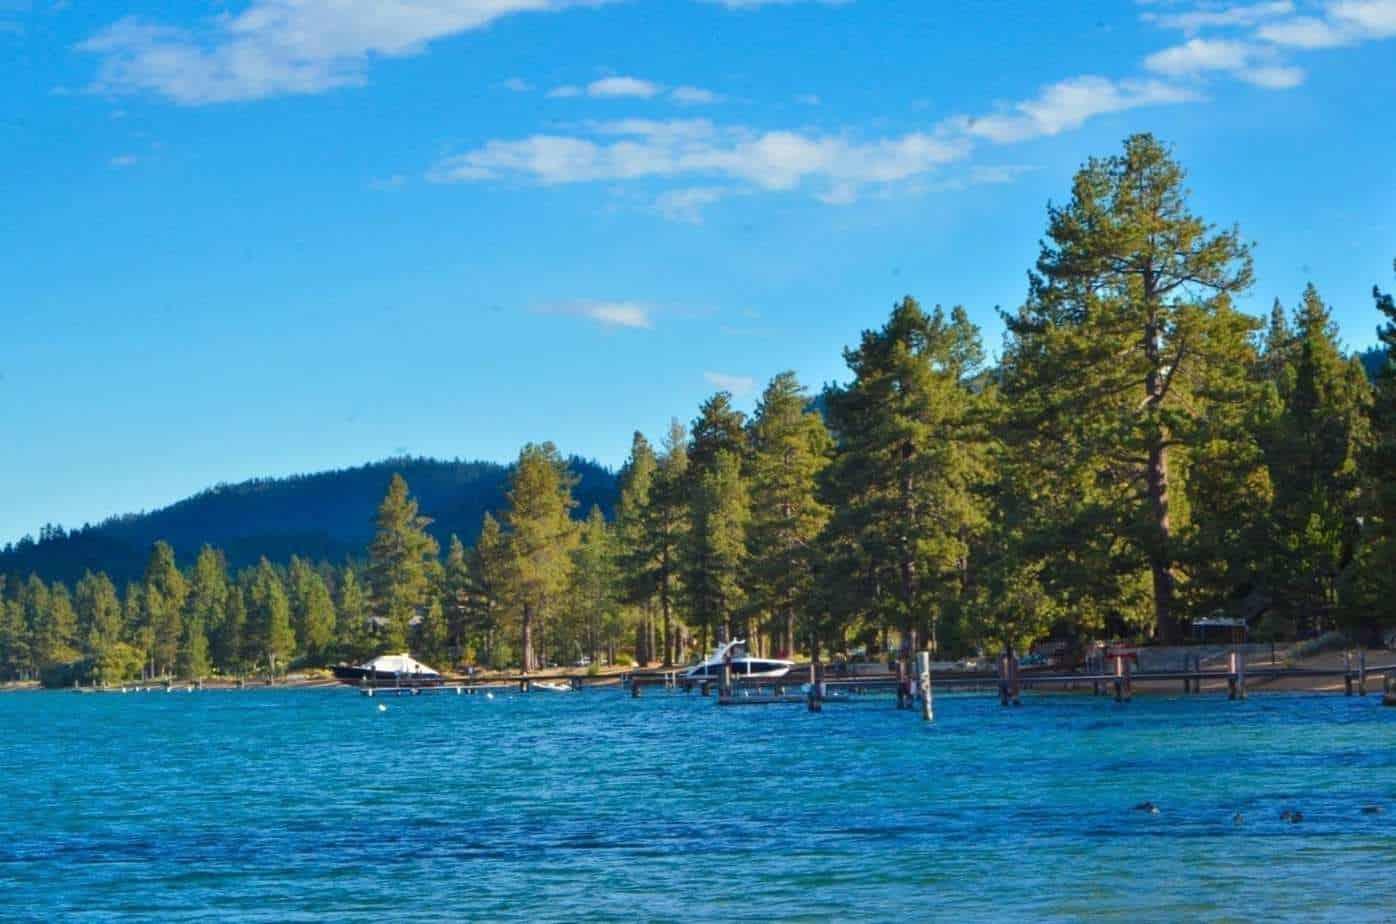 Visiting South Lake Tahoe